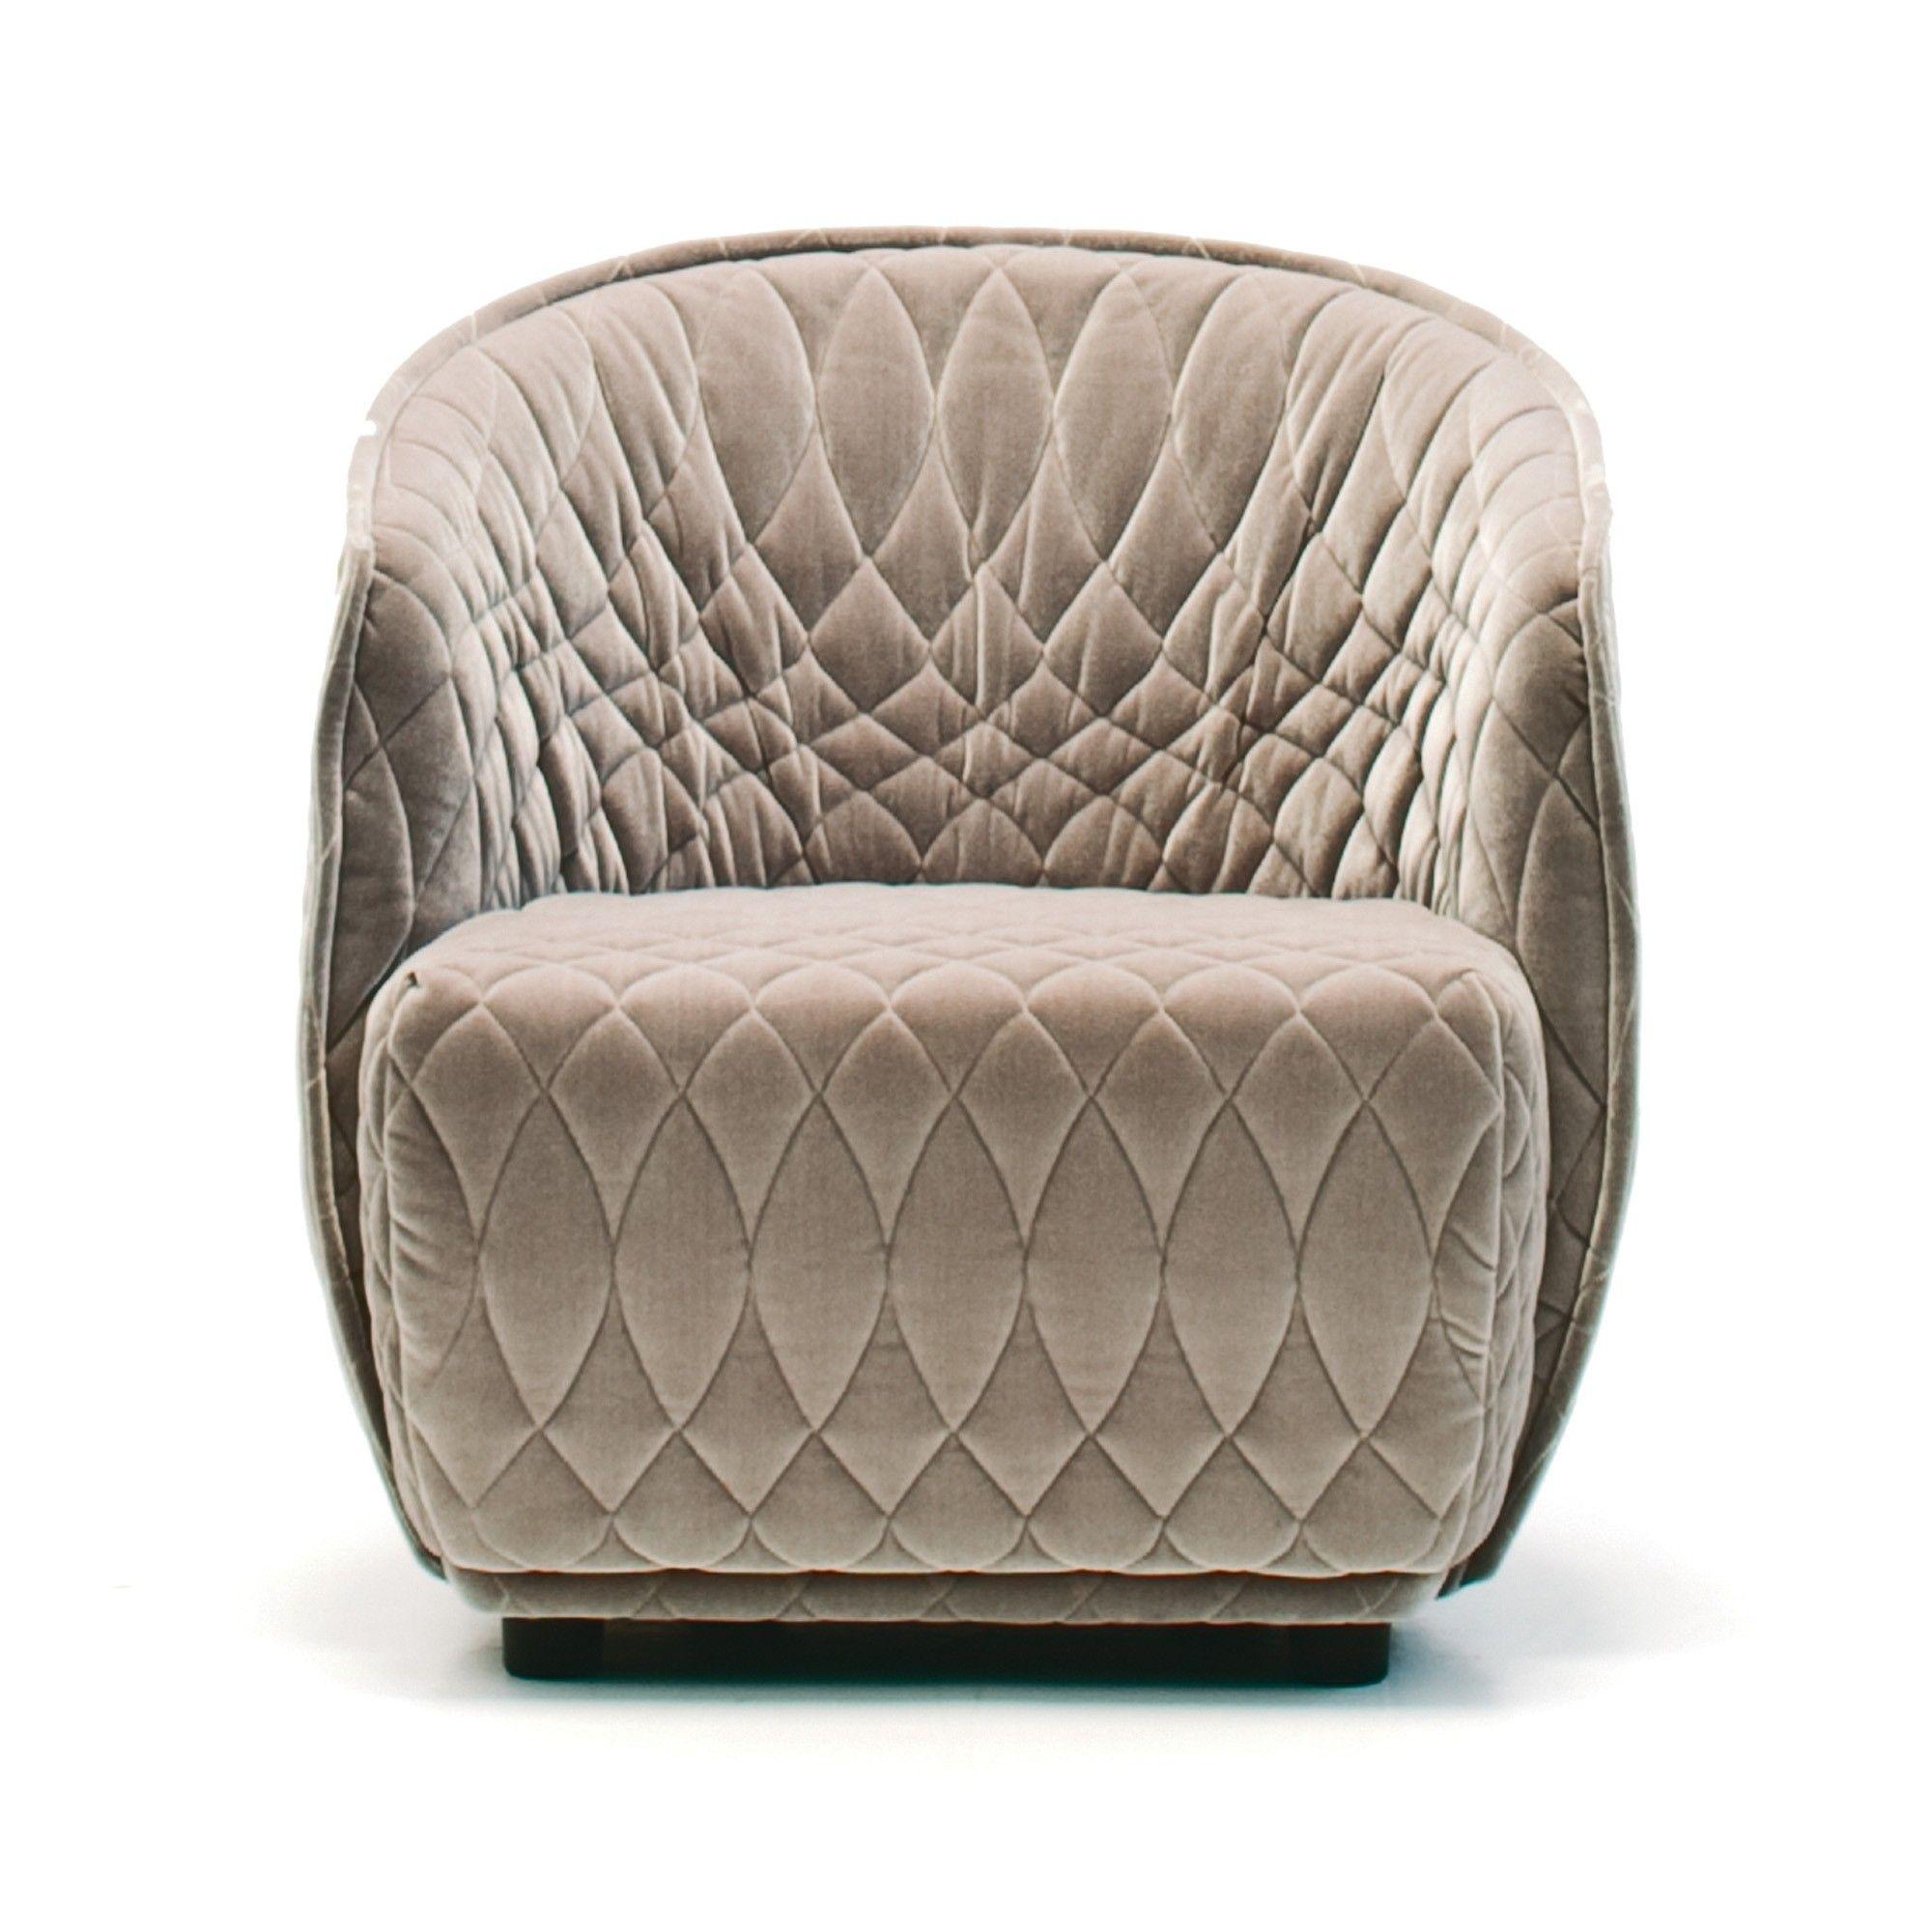 Petit Fauteuil REDONDO marron - MOROSO | Chairs | Pinterest | Butacas